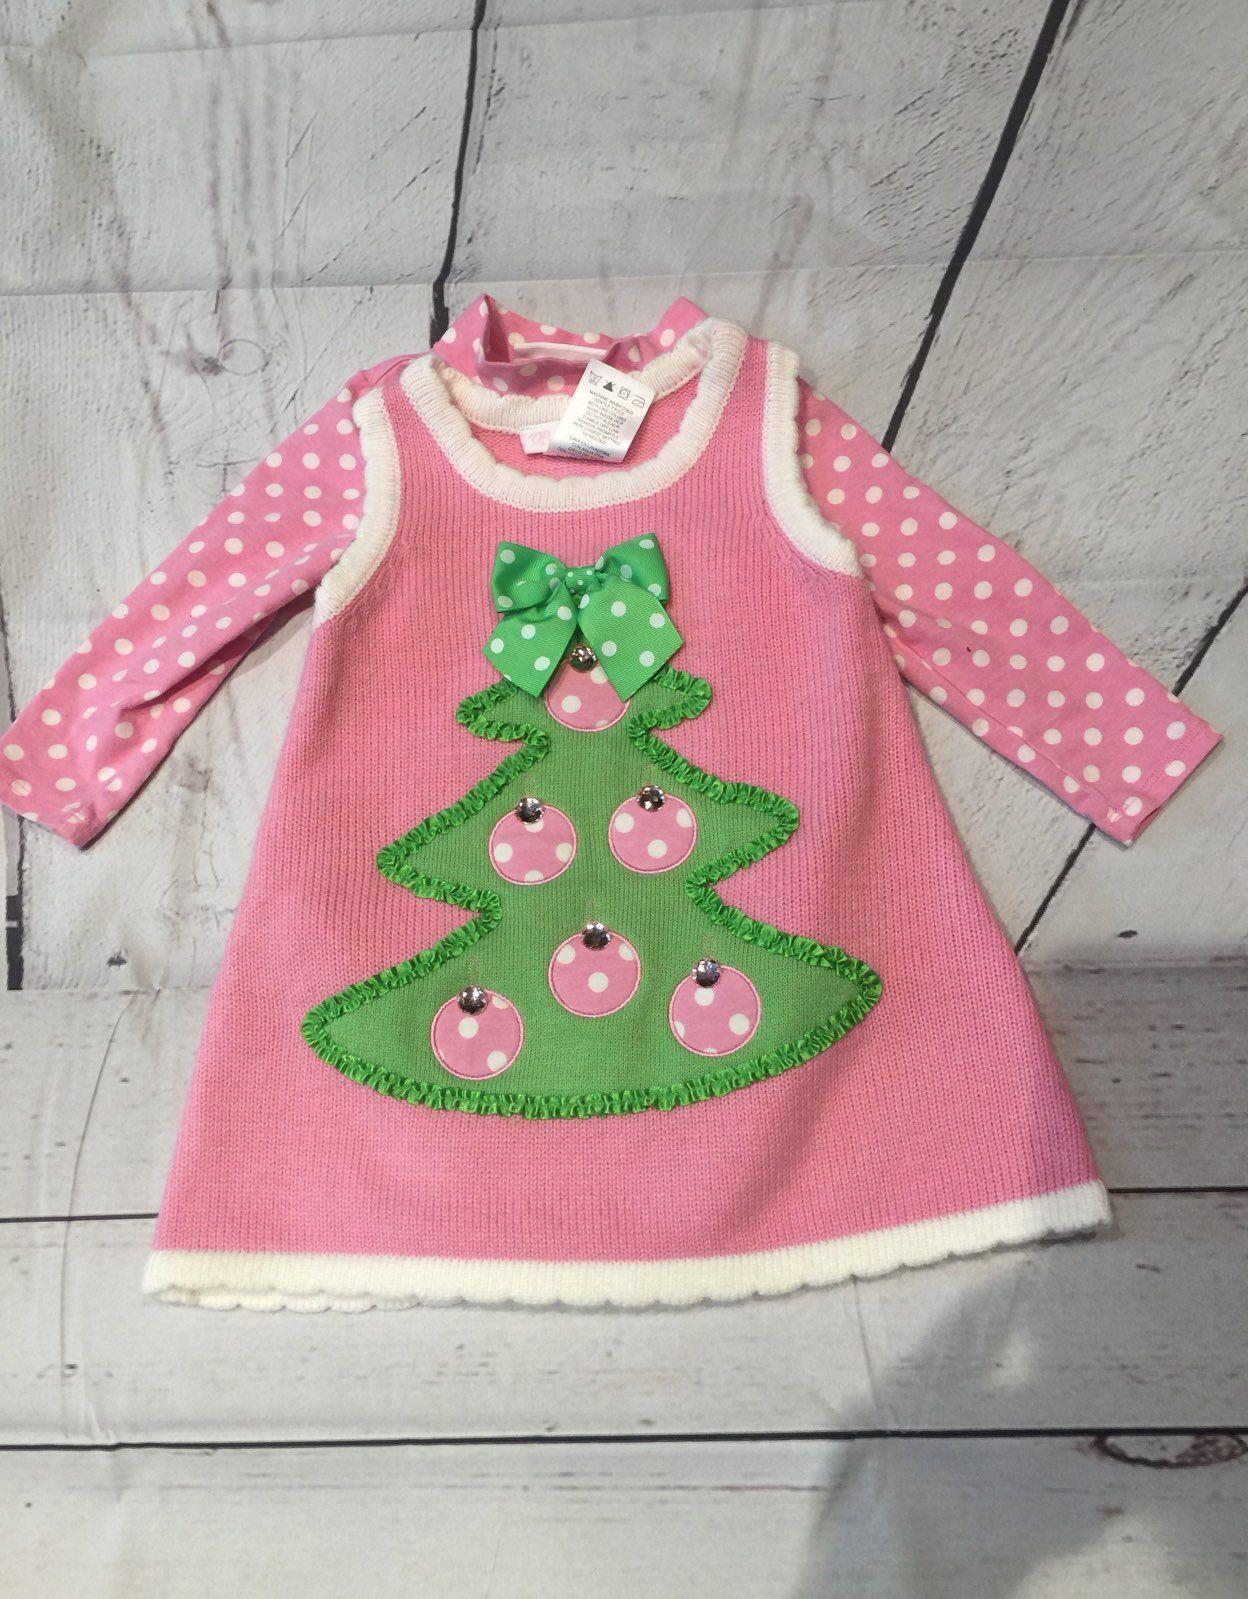 Pink Holiday Sweater Dress Christmas! - Mercari: BUY & SELL THINGS ...